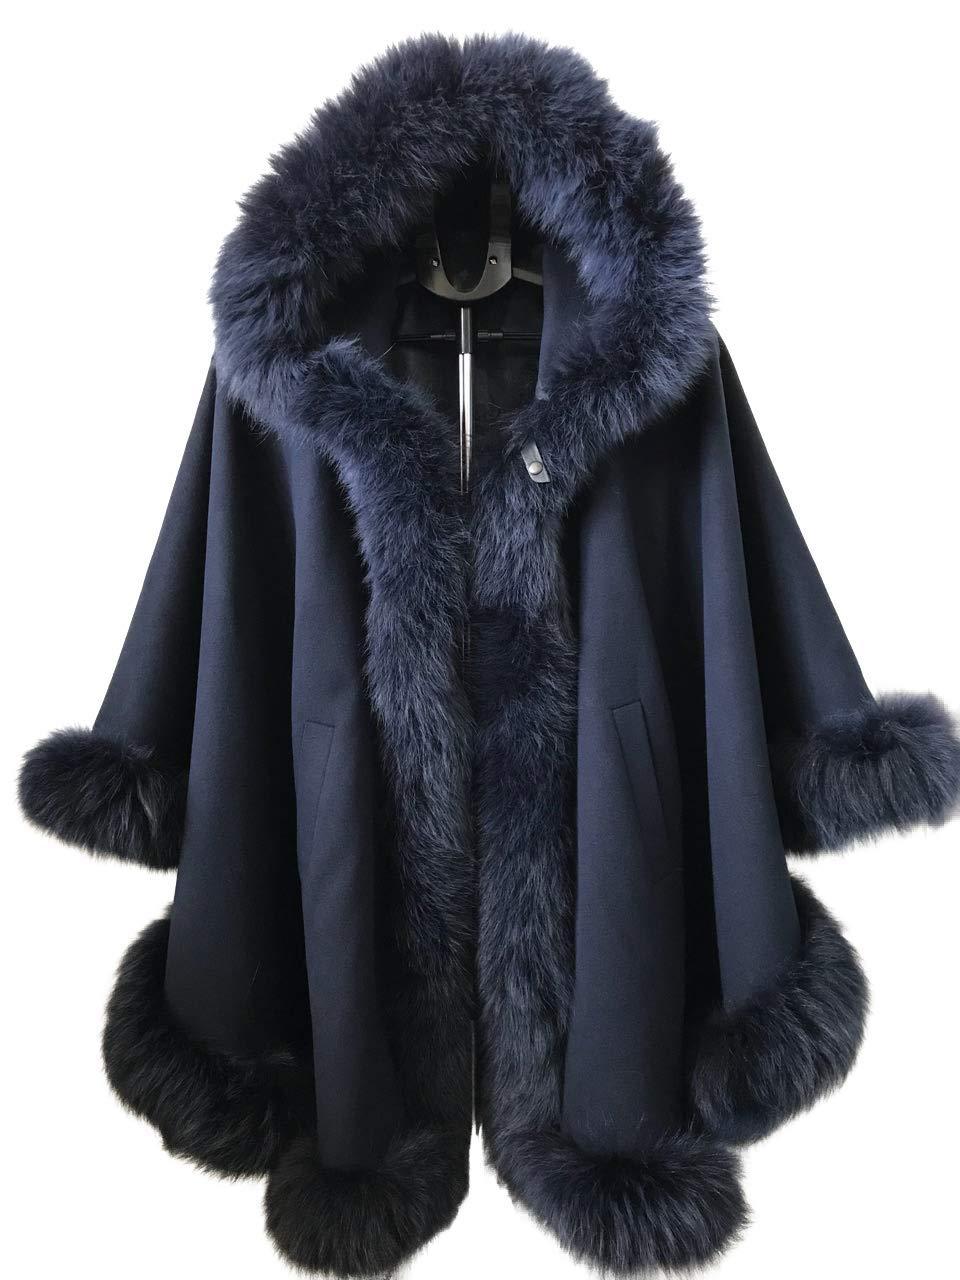 Poncho Cape hood cashmere Cheap bargain fur Max 89% OFF trim fox